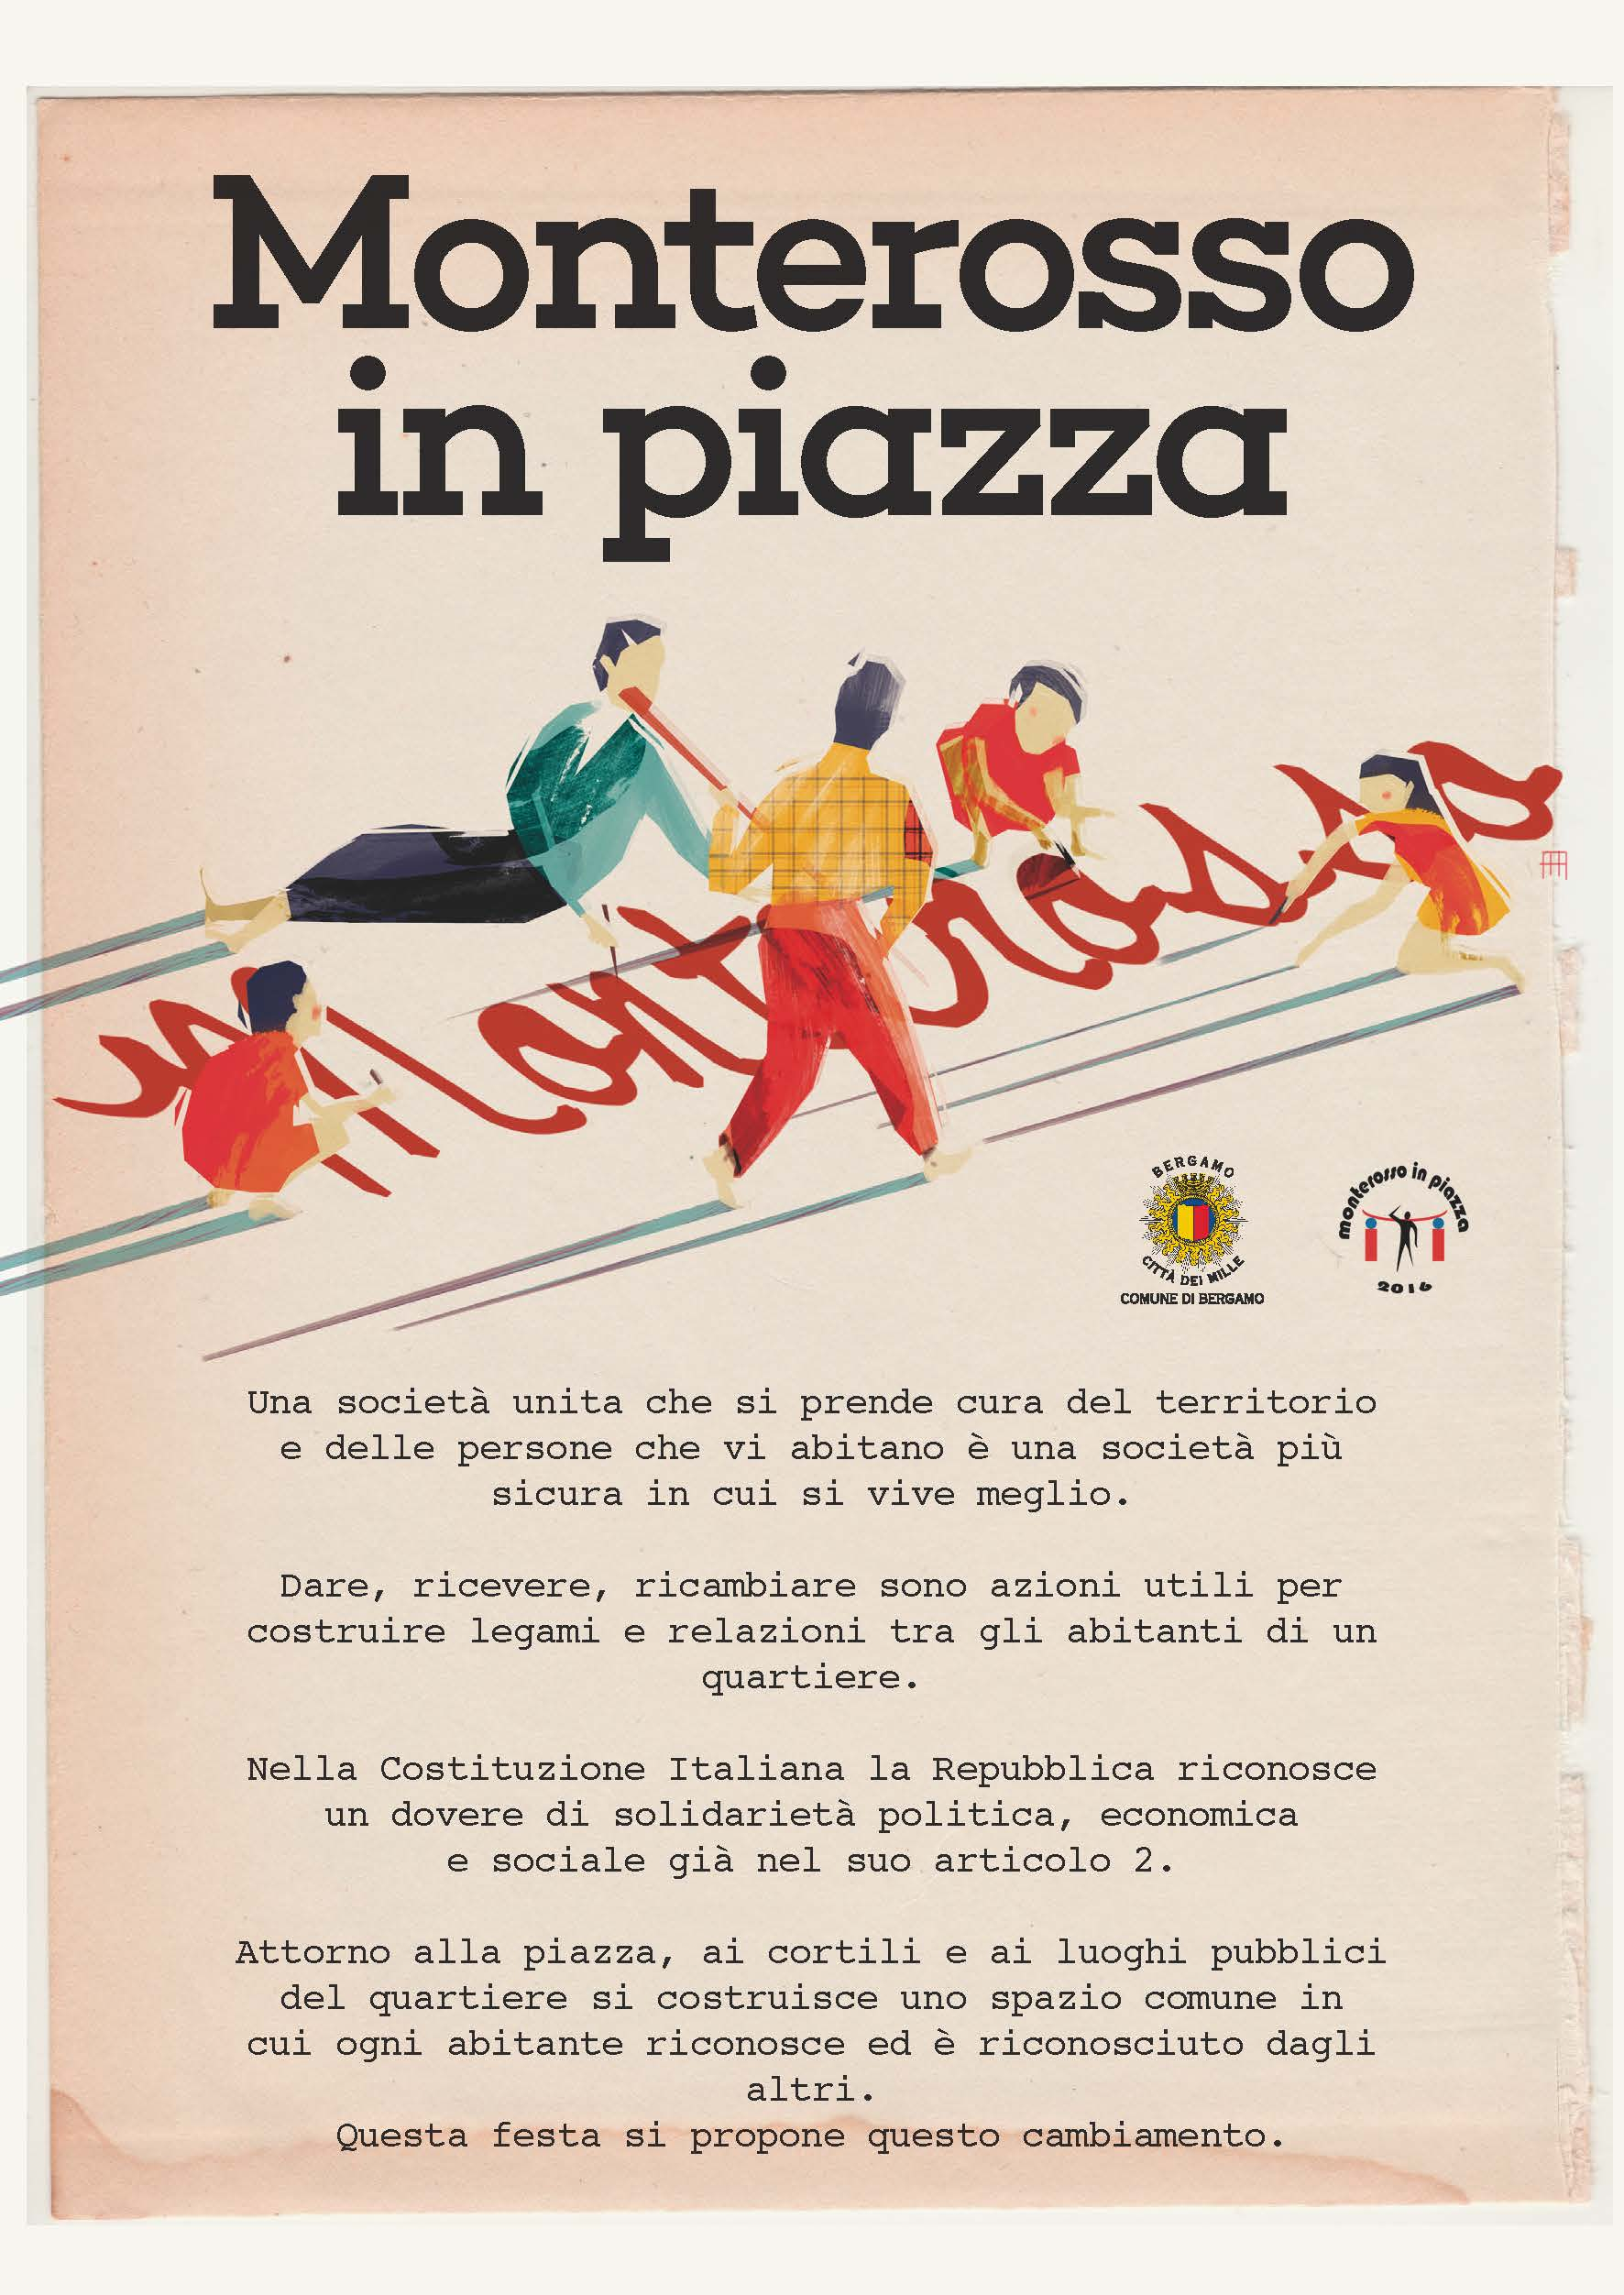 MonterossoInPiazza2016_01